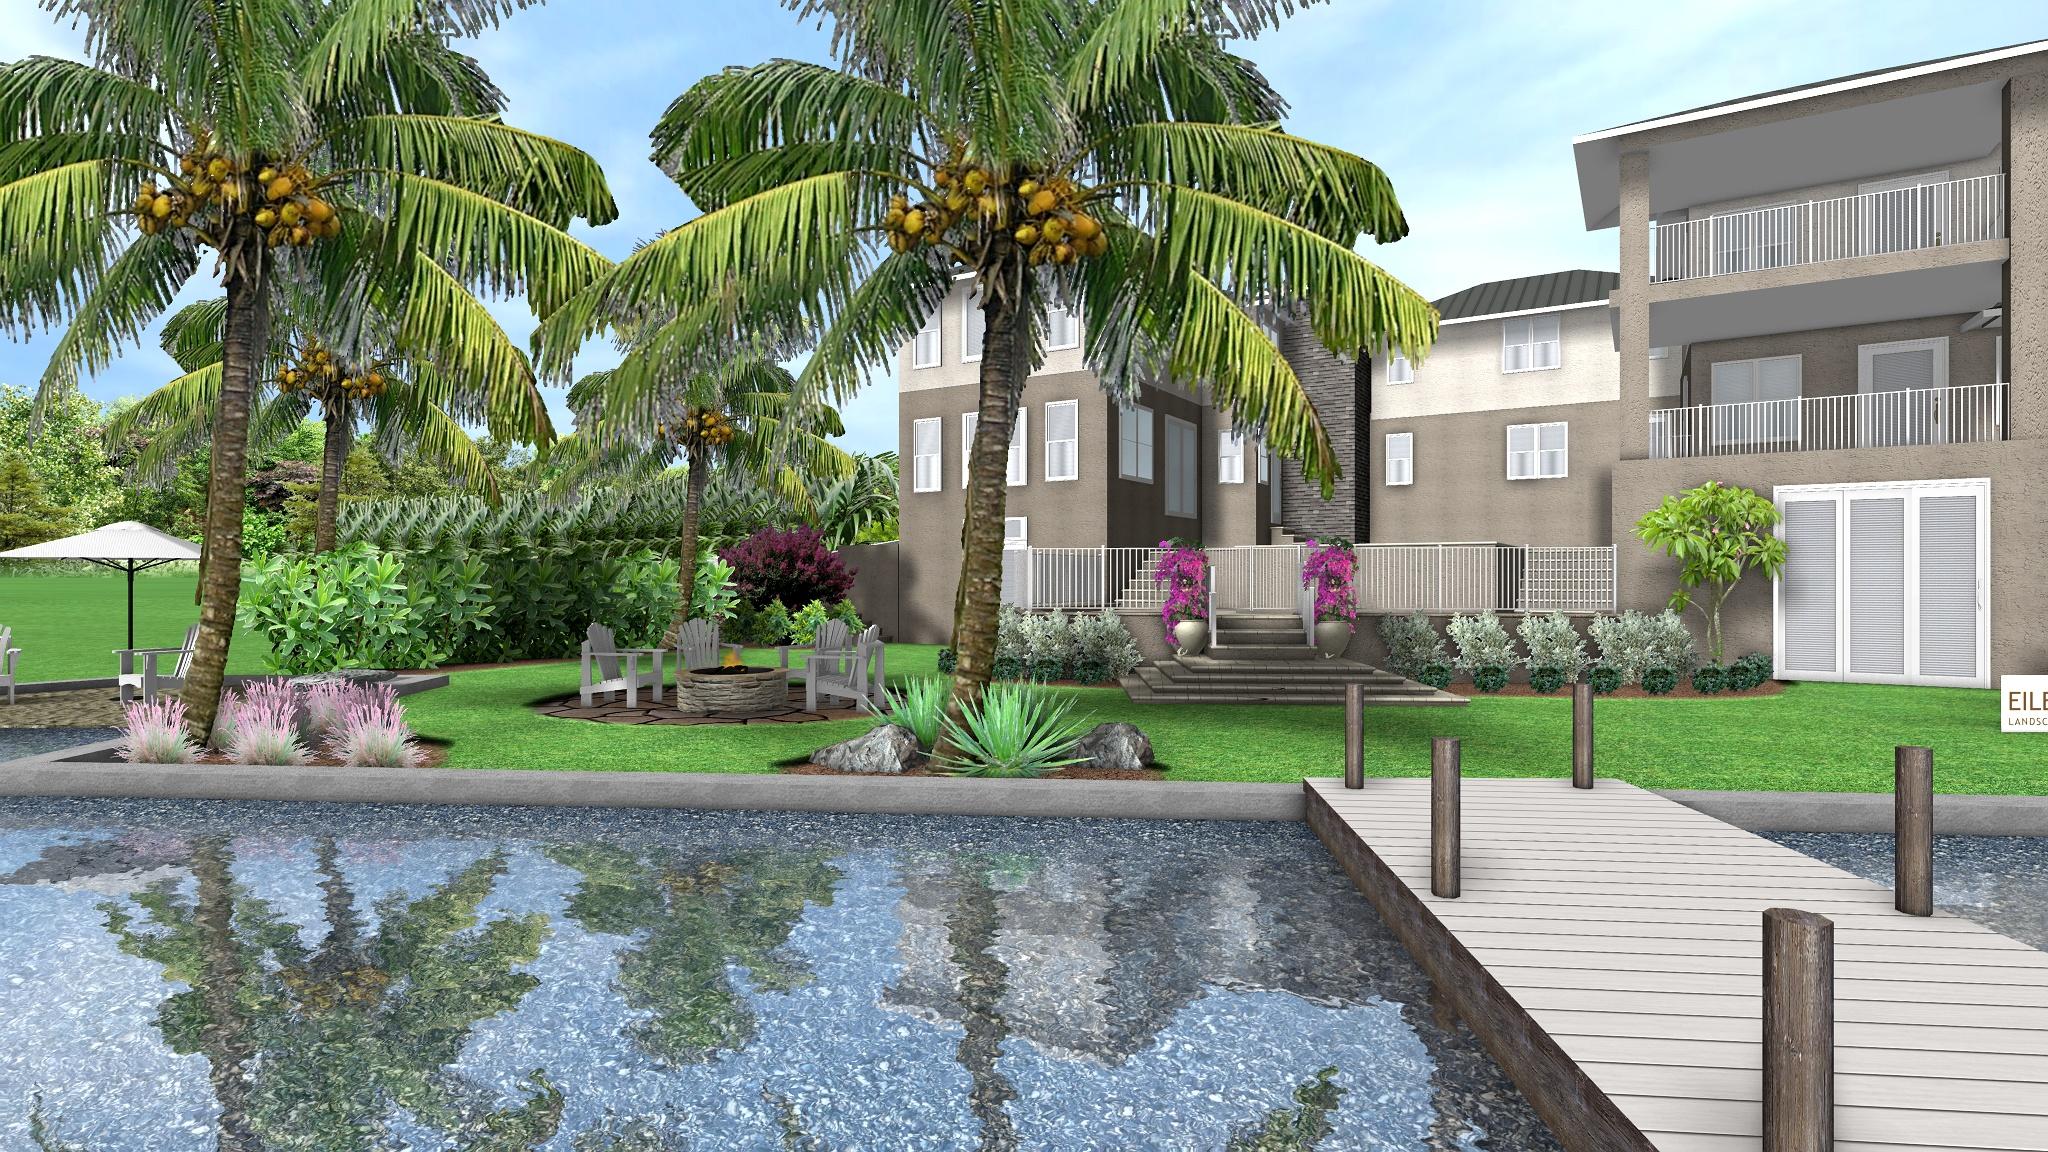 Tropical Landscape Design for Waterfront Home, Stuart, FL